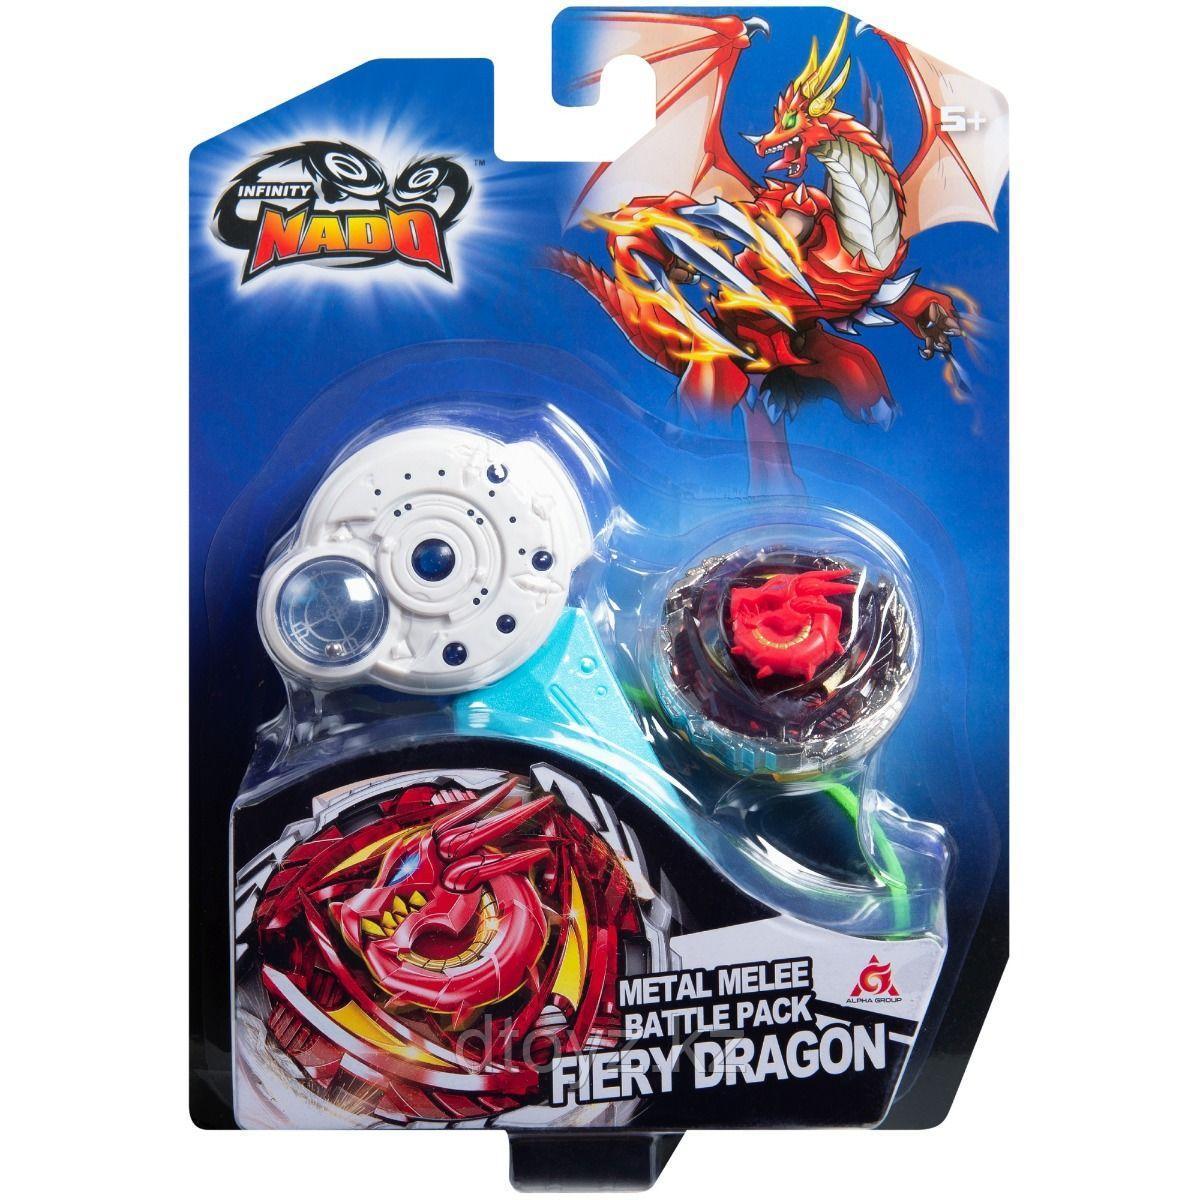 Infinity Nado: Волчок Классик, Fiery Dragon